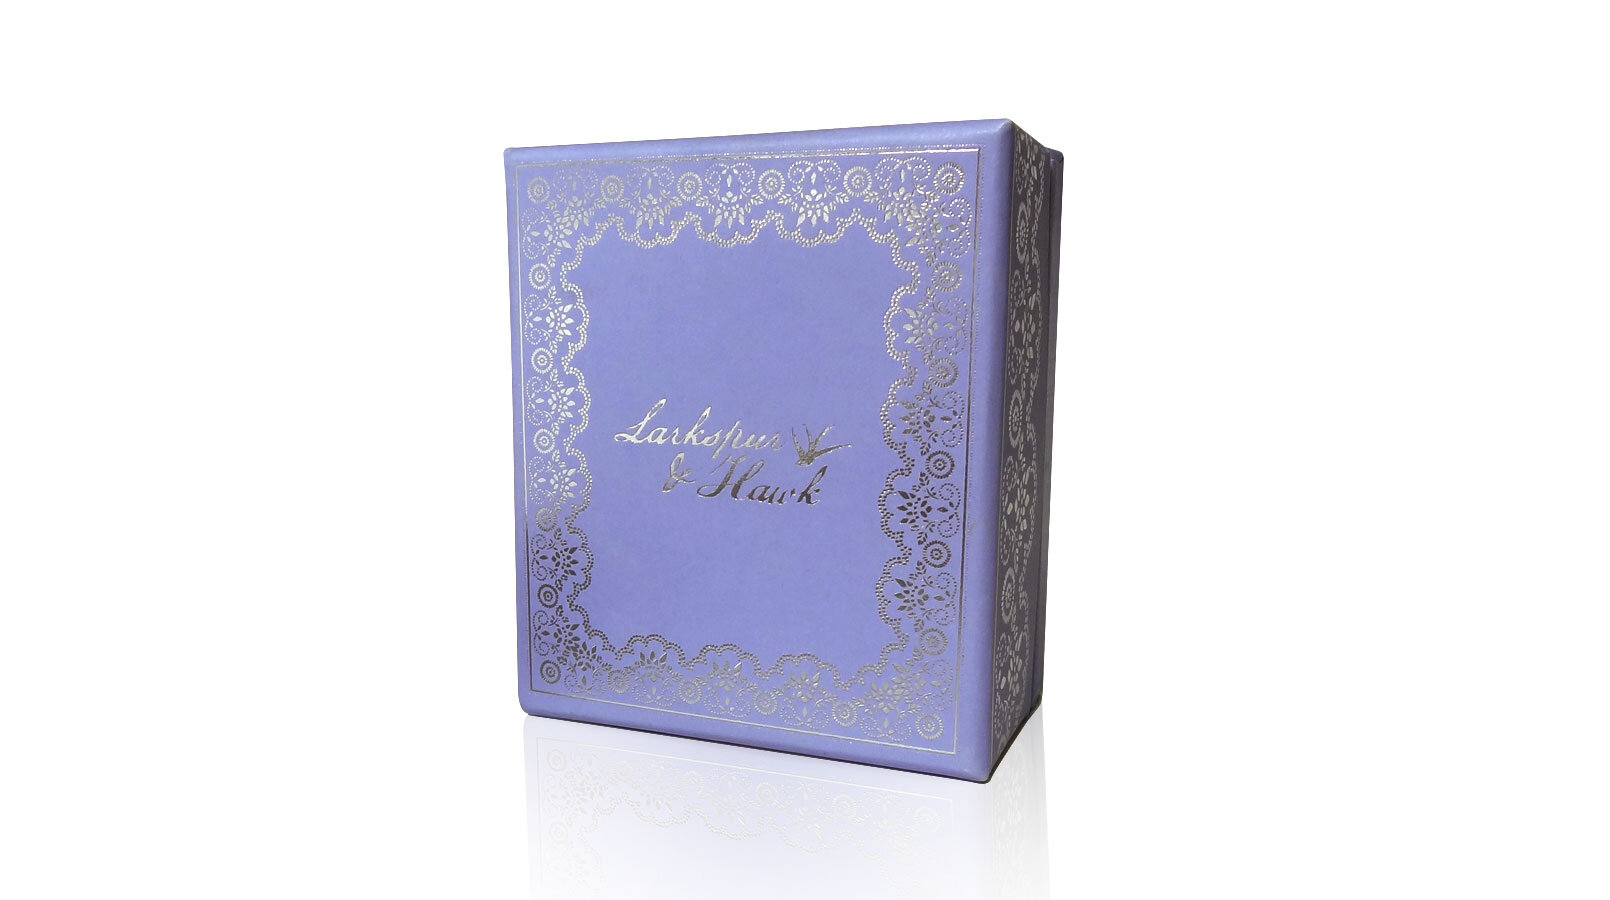 Larkspur-Hawk-Box-Jewelry-Packaging-Company-Design-3.JPG